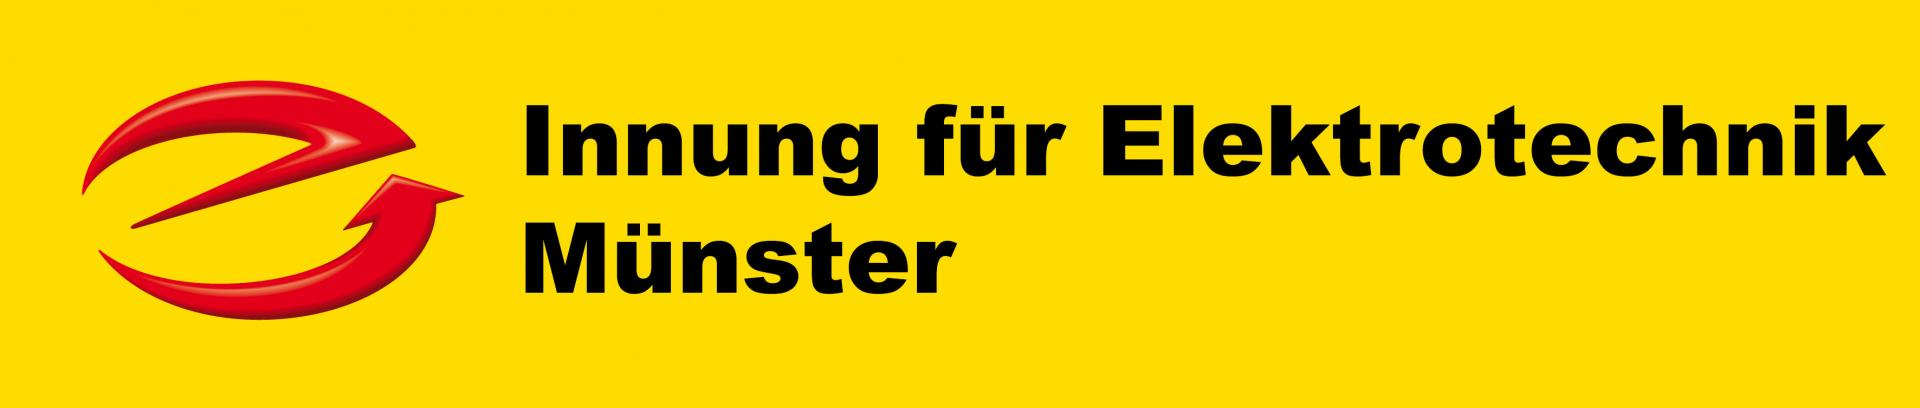 Elektrotechnik Münster